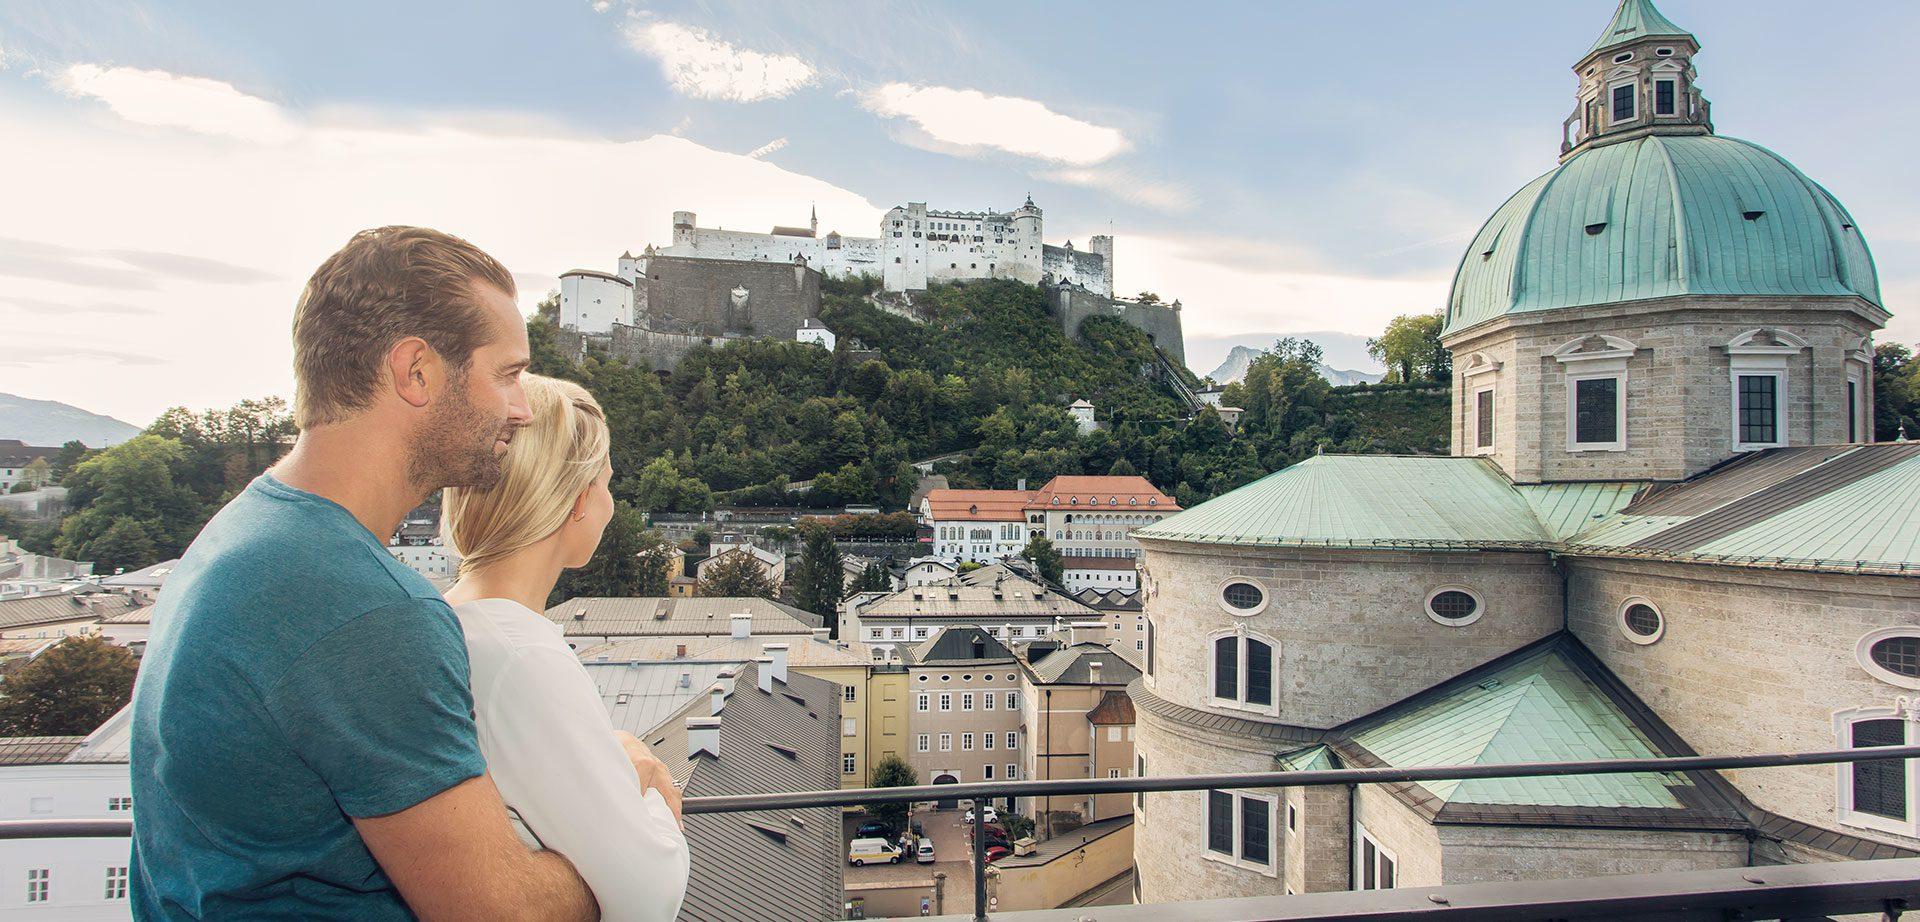 Excursion destination Salzburg city